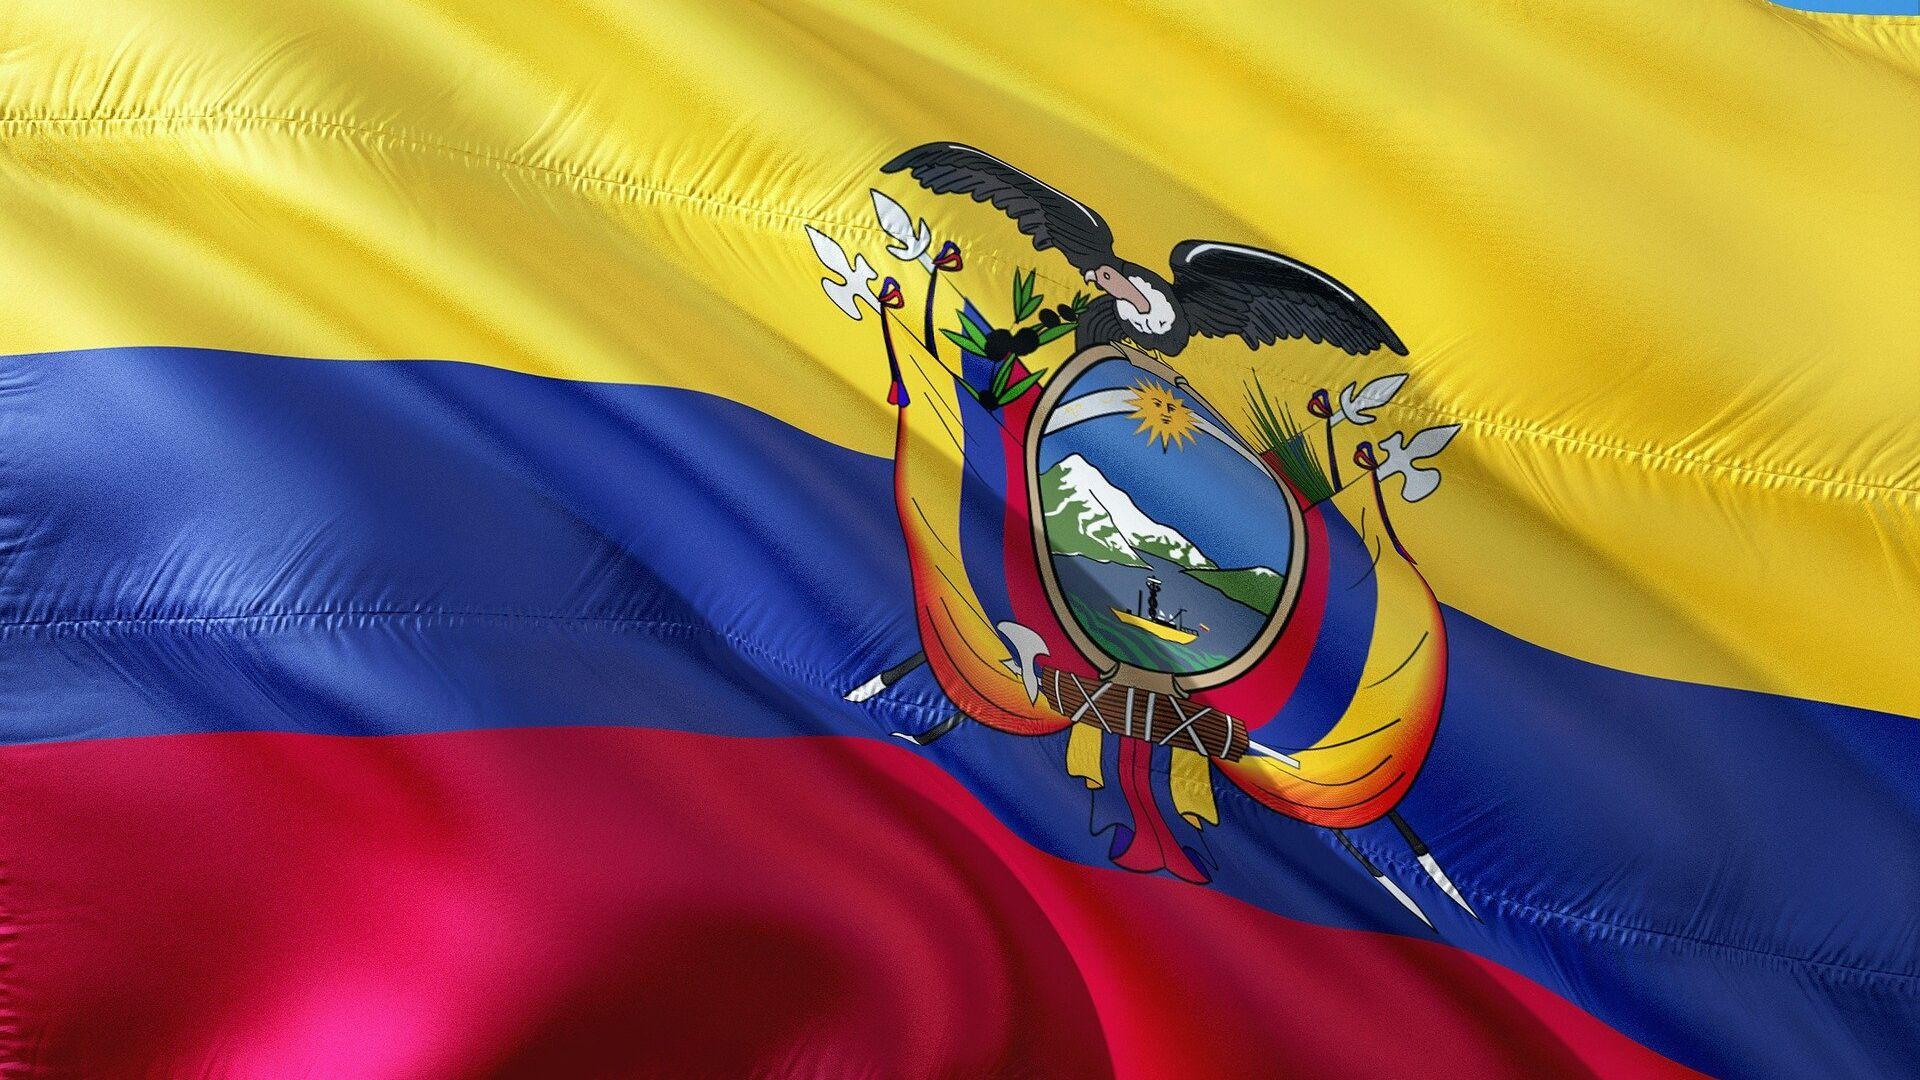 La bandera de Ecuador - Sputnik Mundo, 1920, 20.03.2021